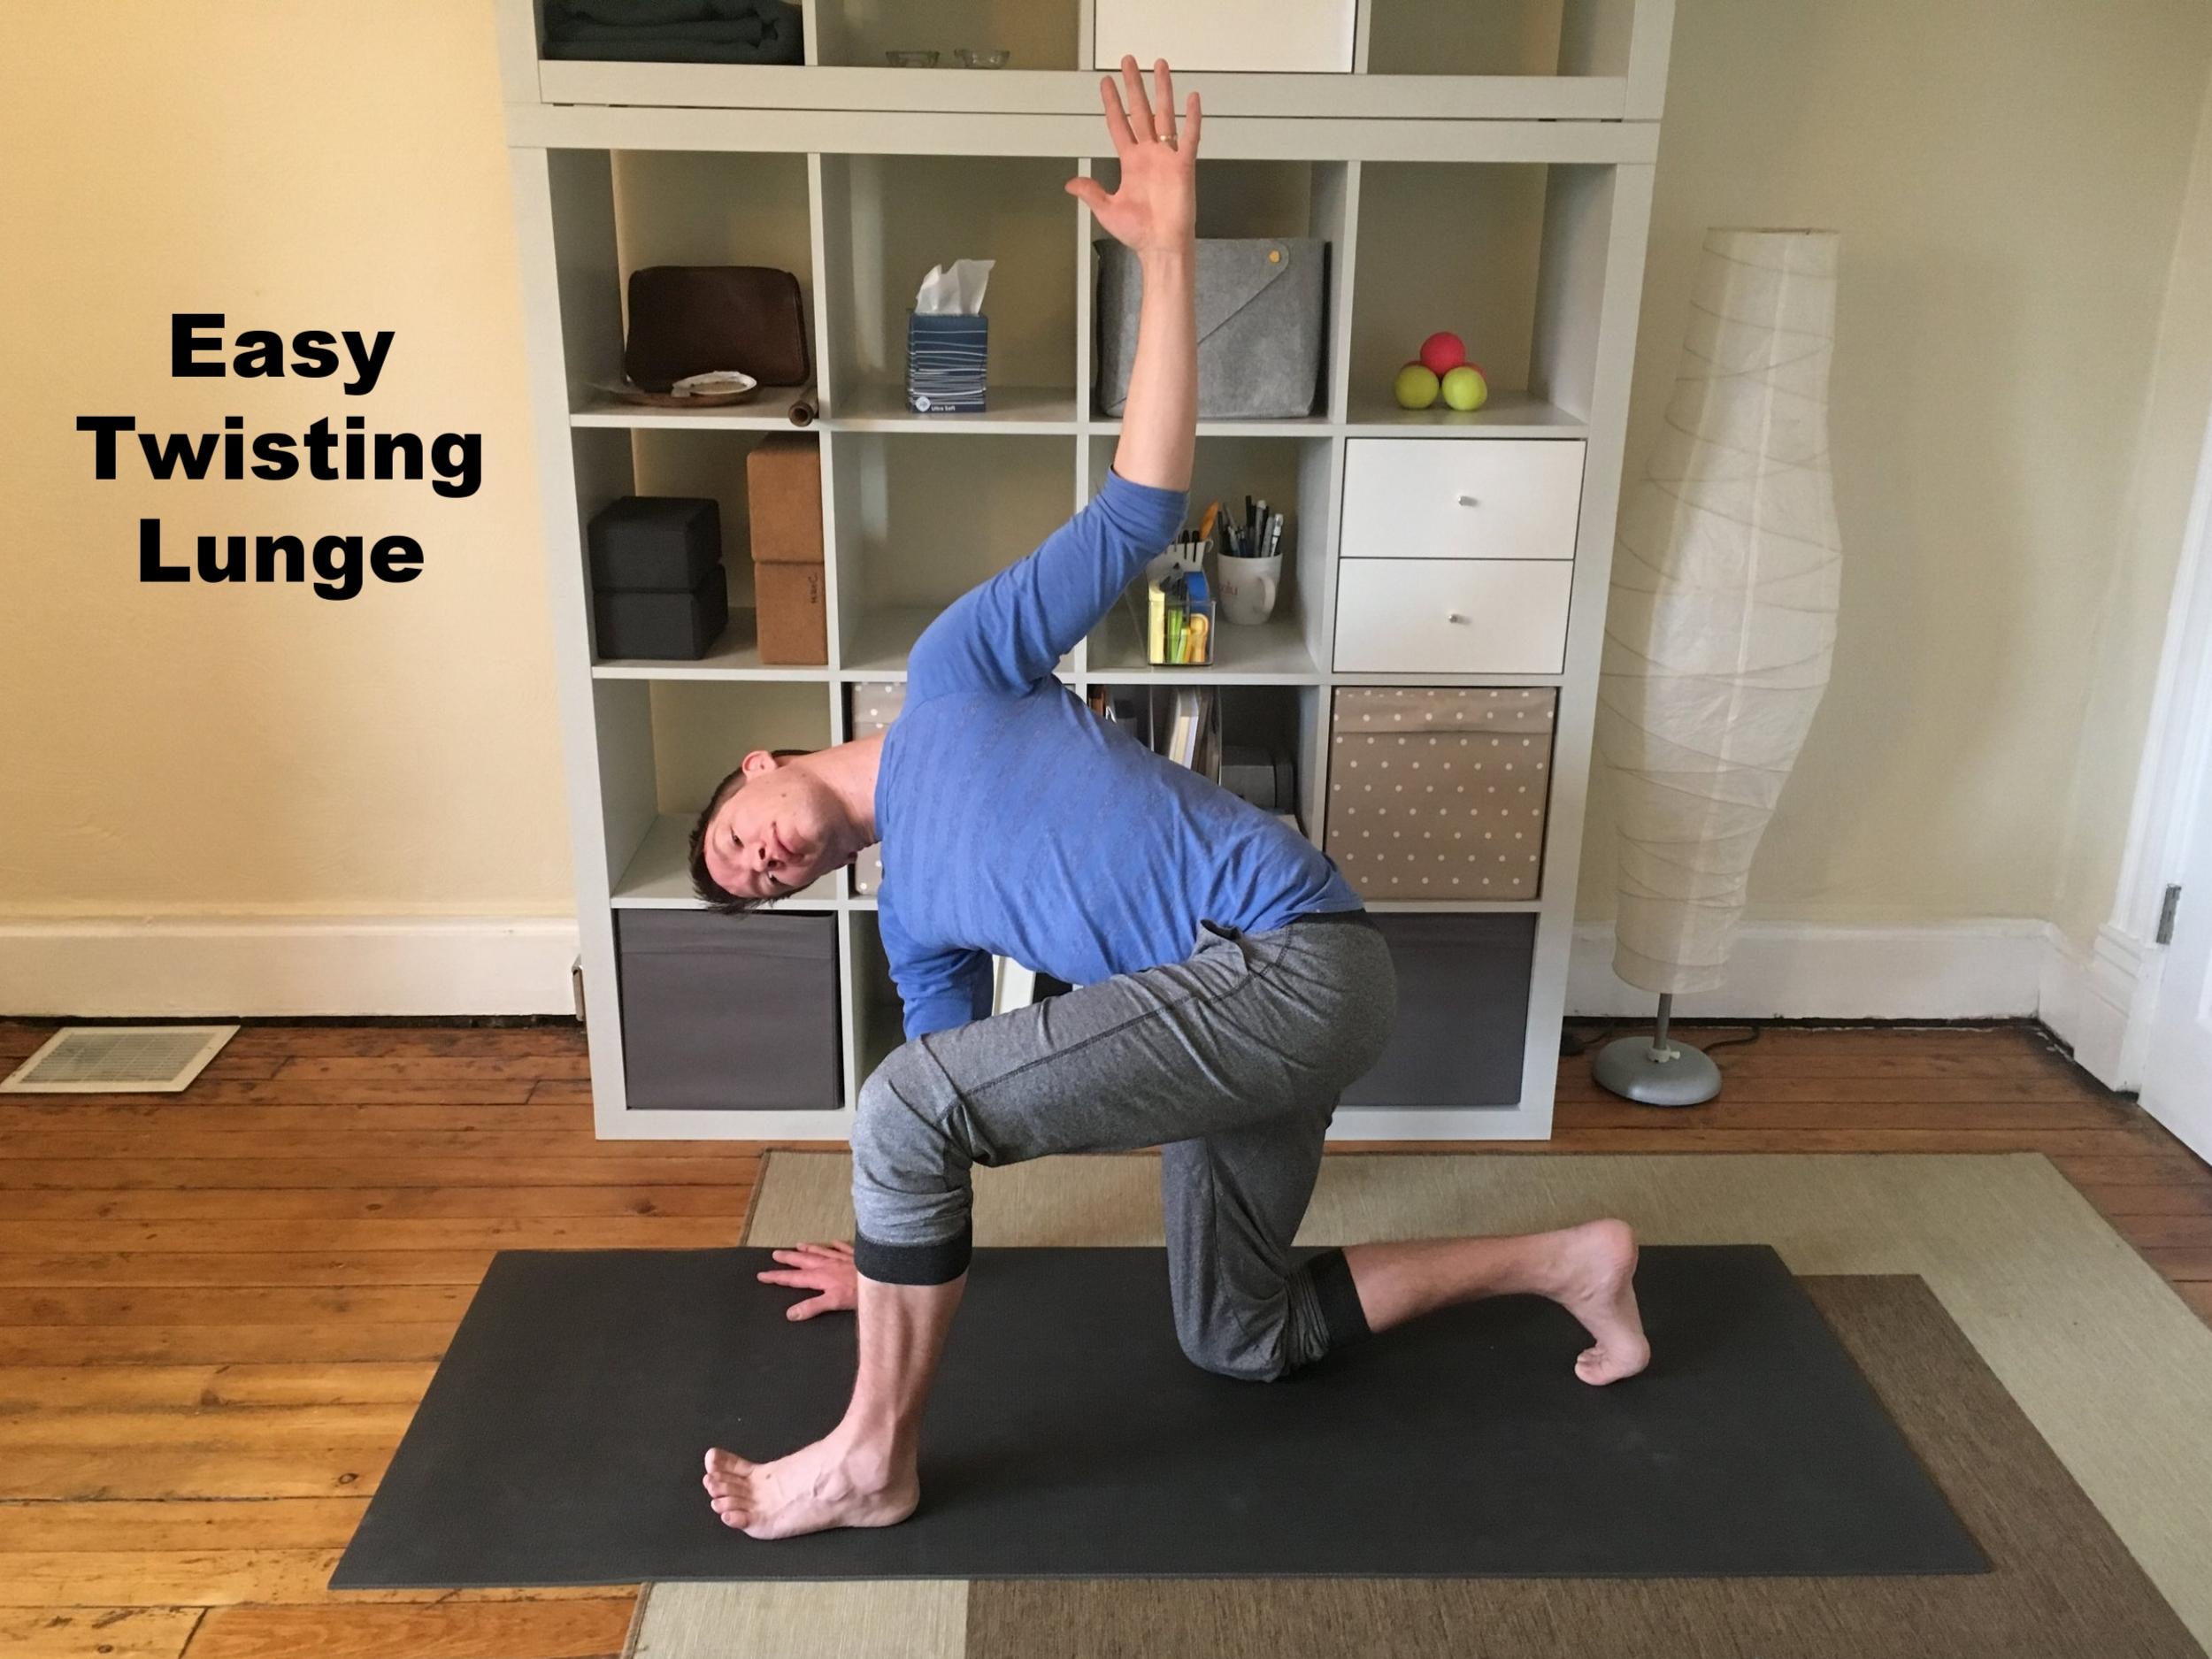 easy twisting lunge.JPG